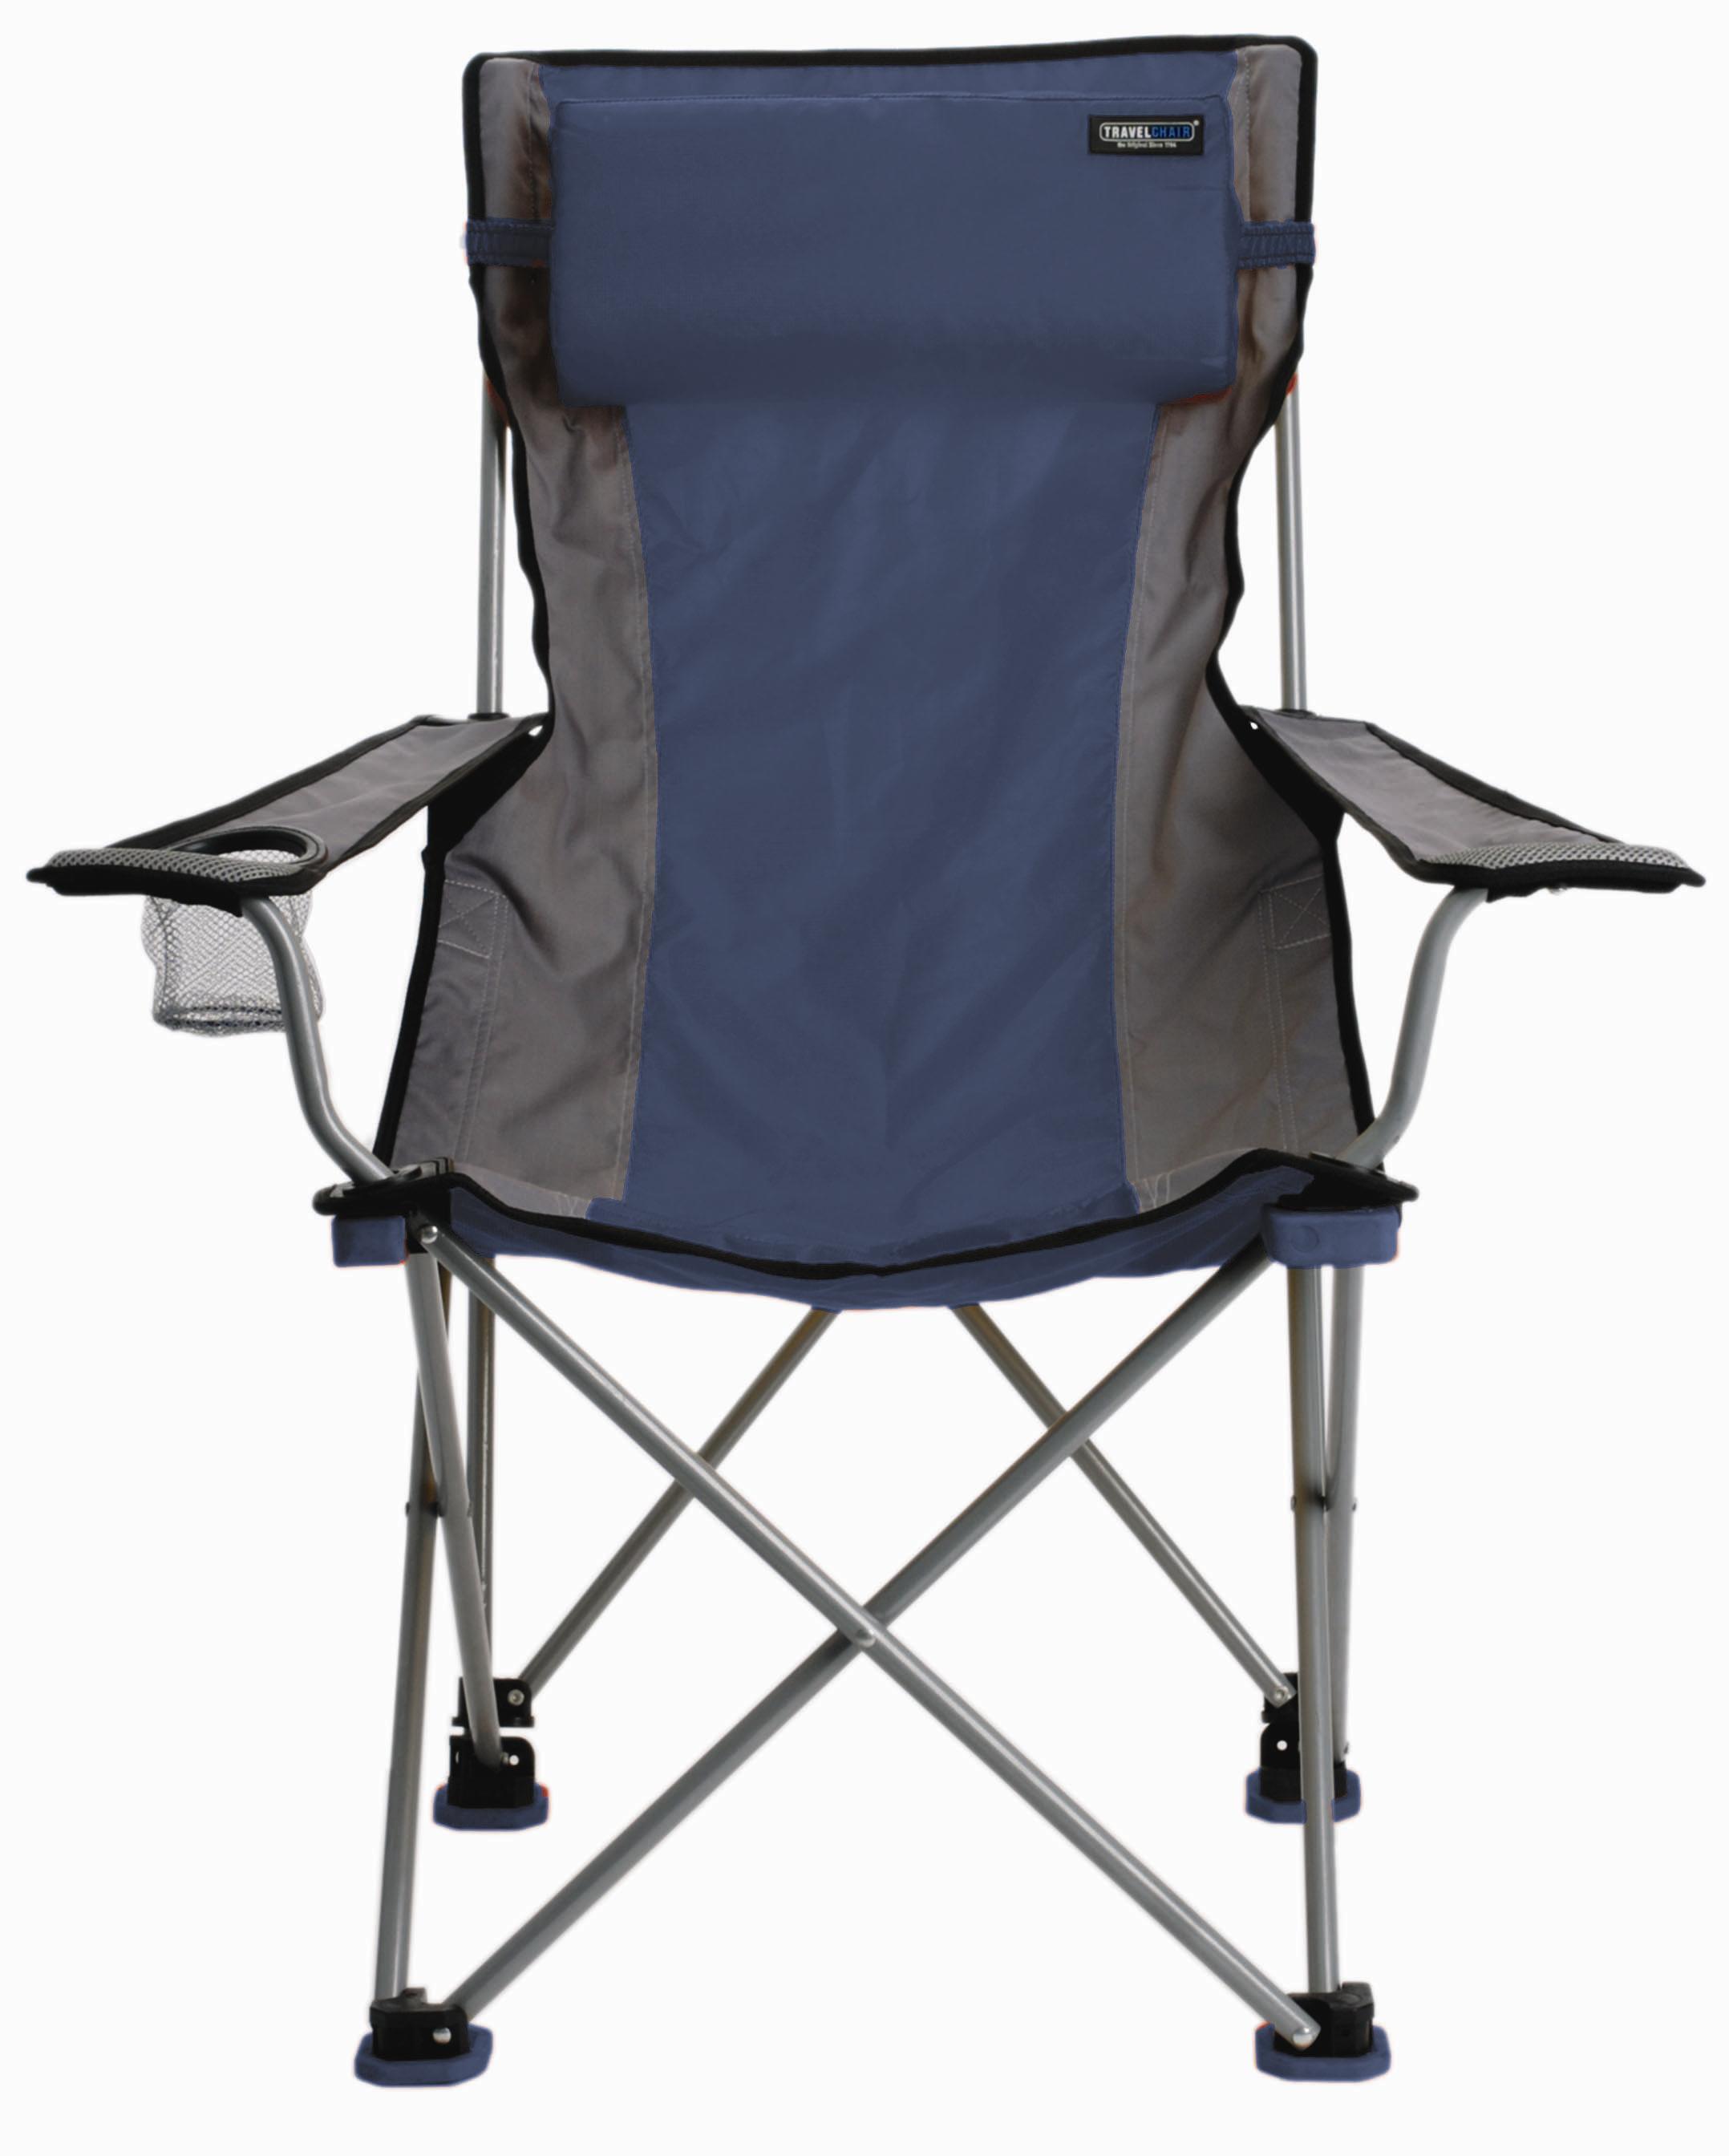 Travel Chair Bubba Outdoor Chair Blue